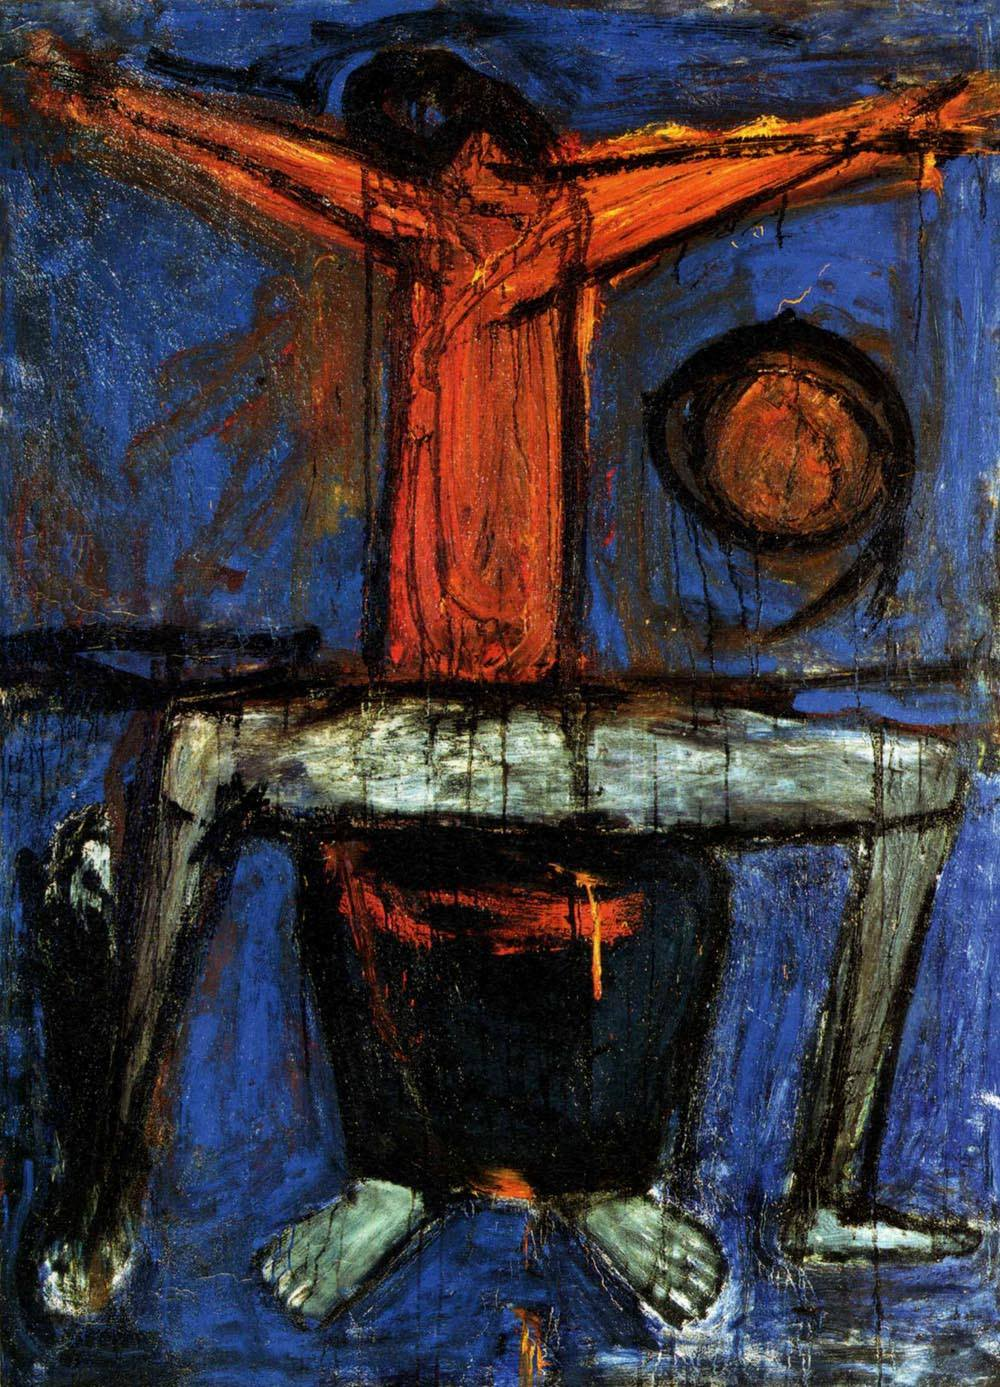 Waldemar Cwenarski, Pieta